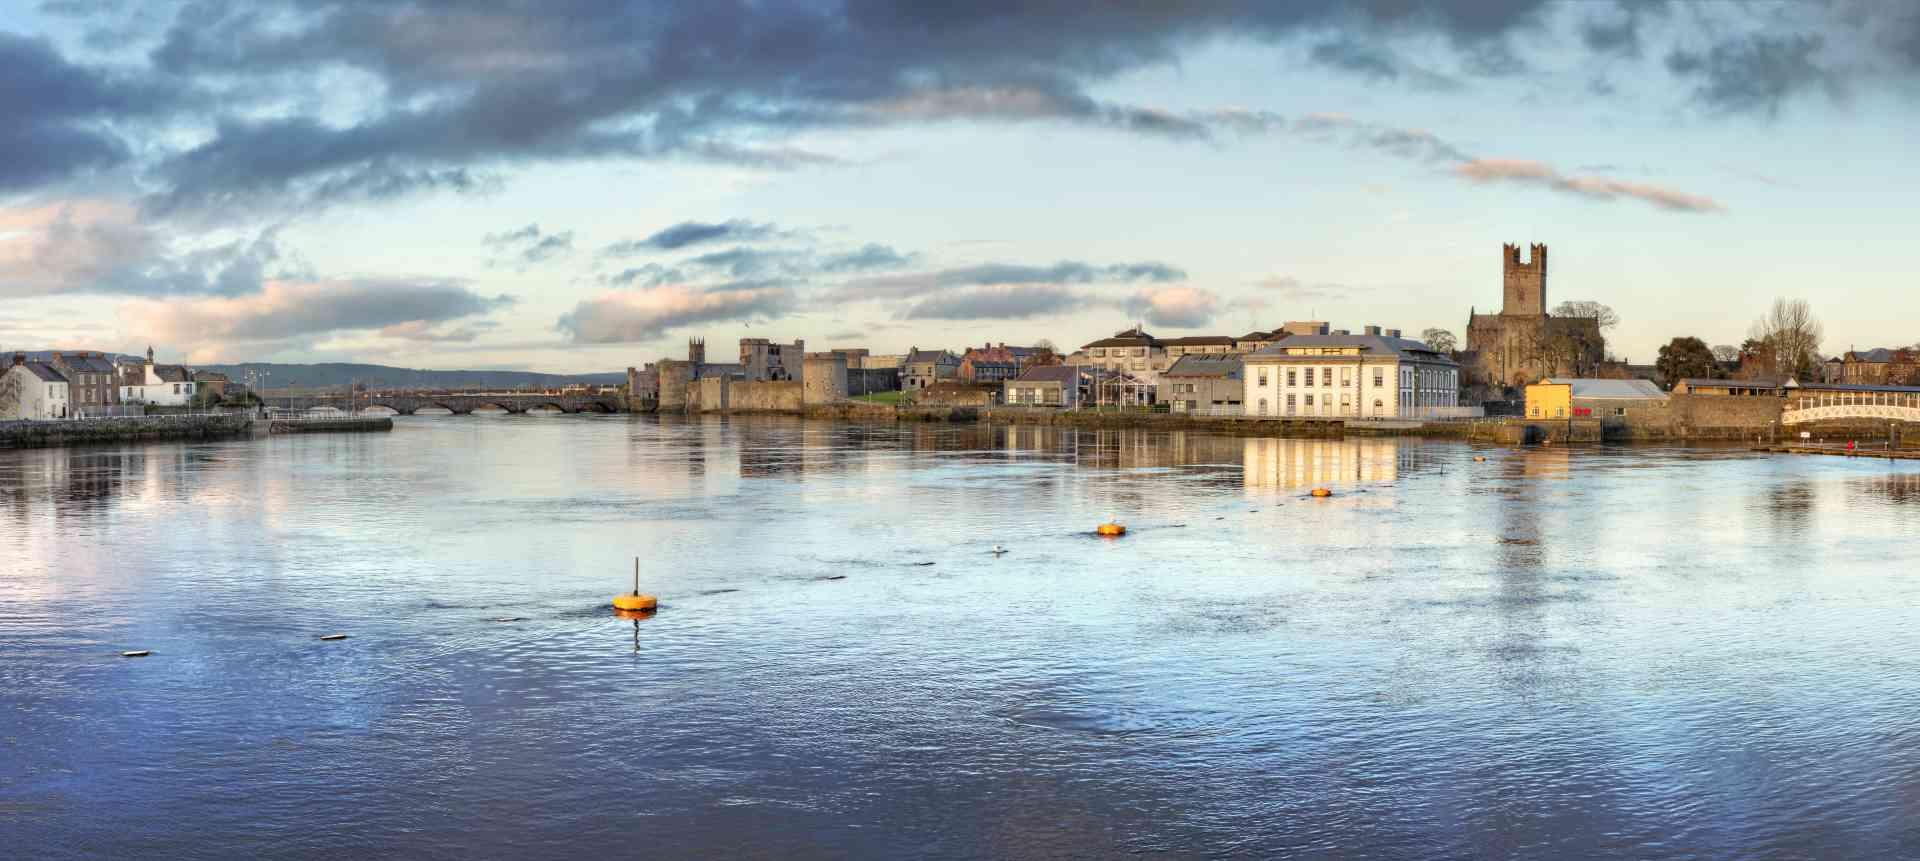 Limerick, Ireland by Adobe Stock